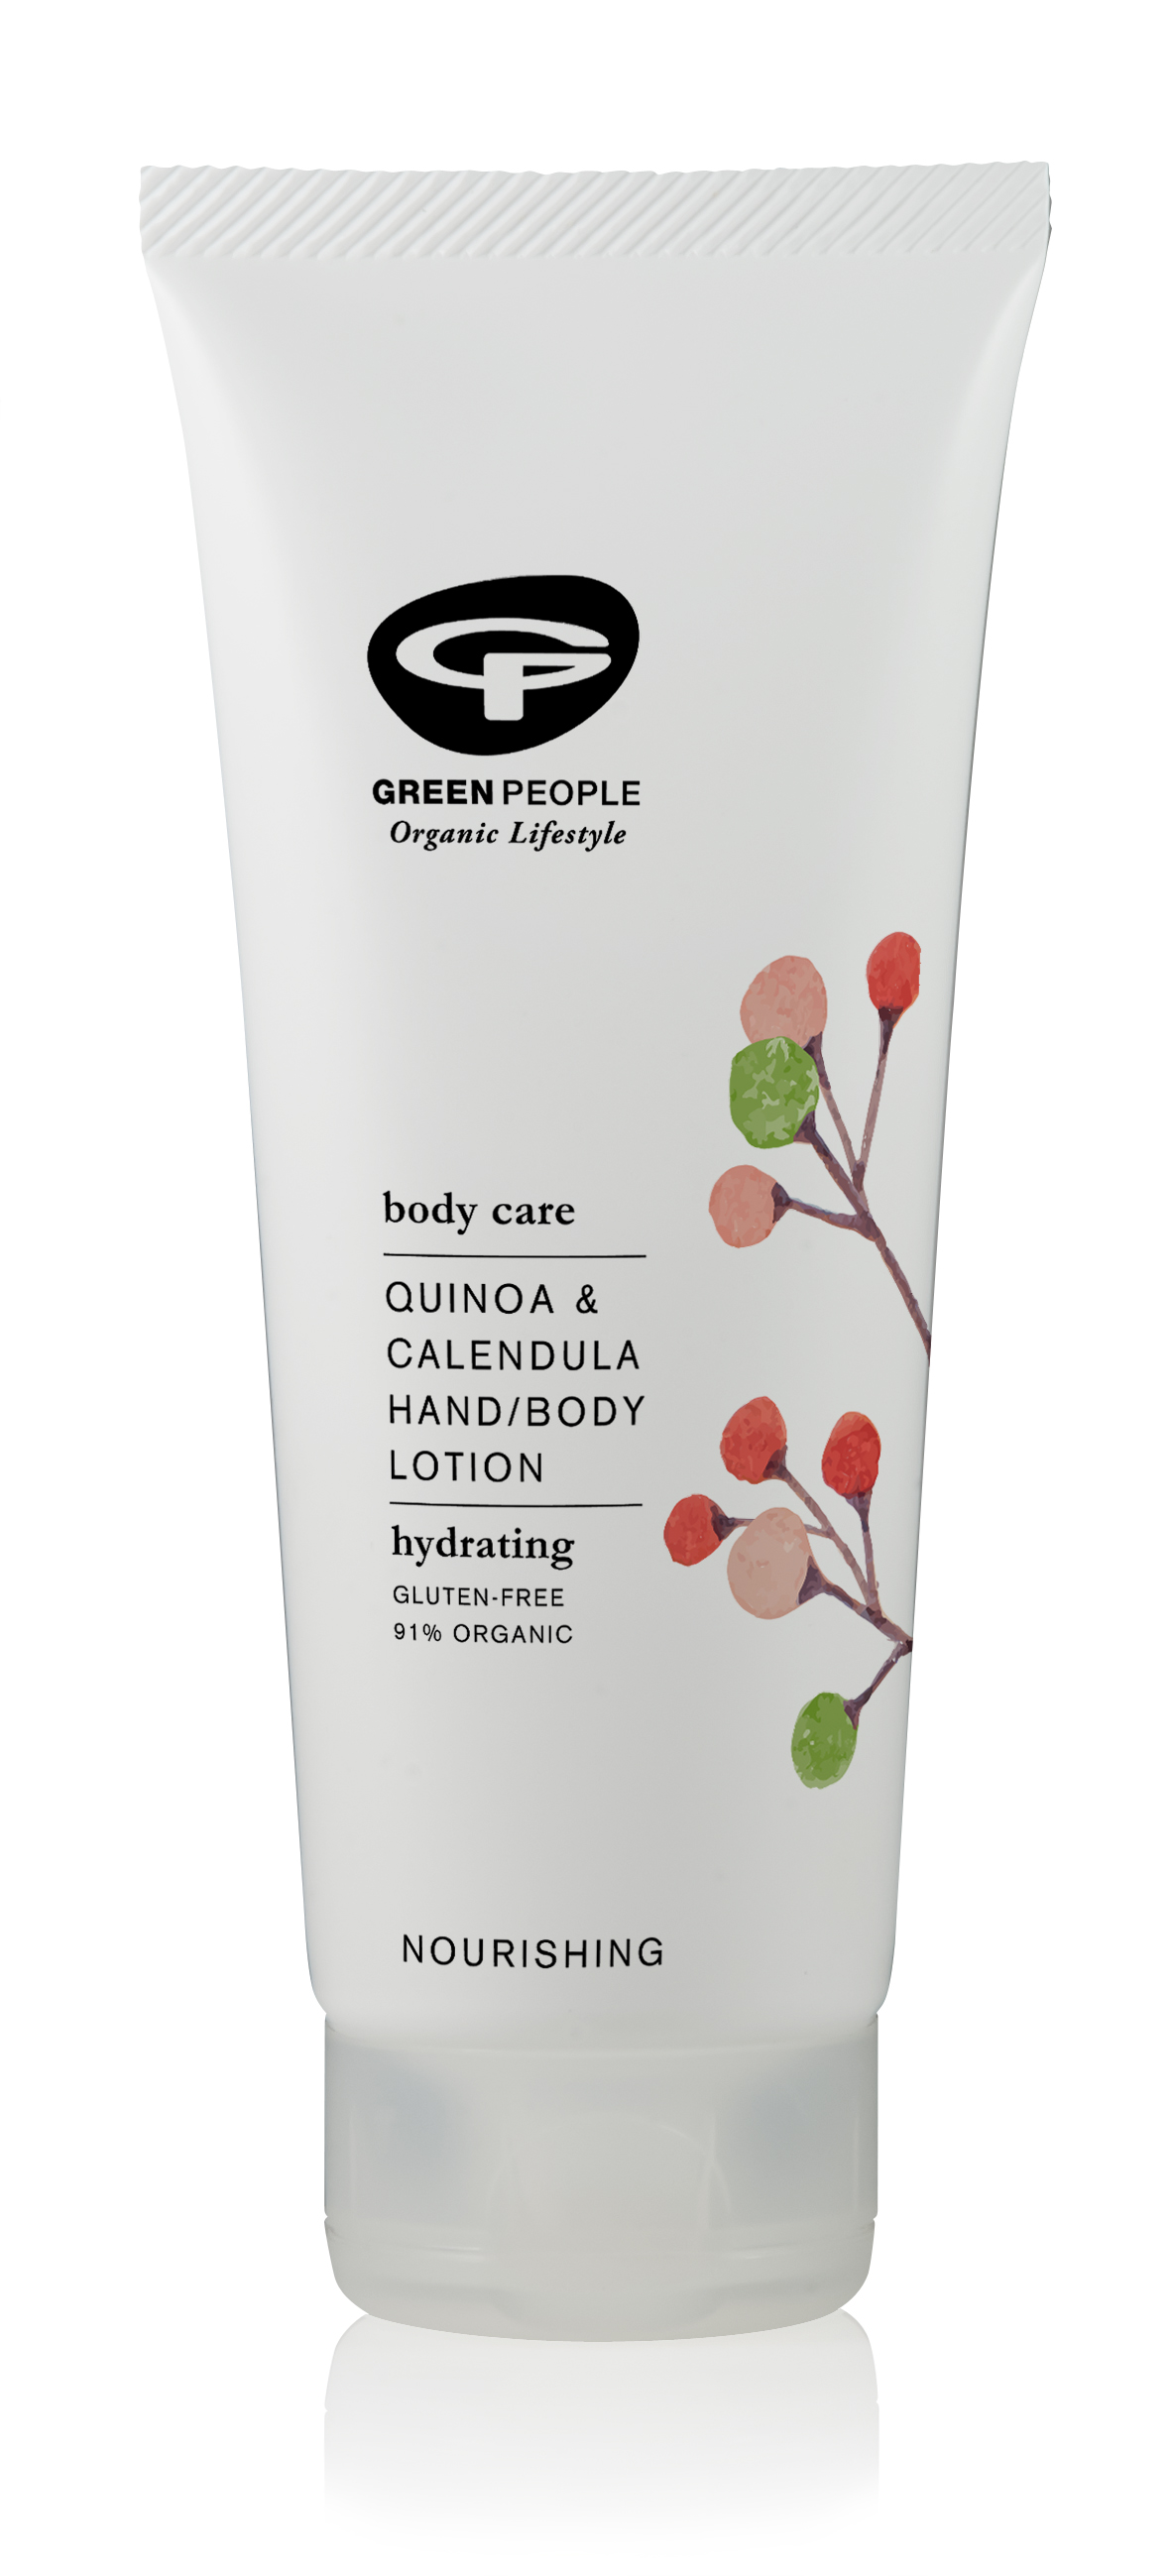 Quinoa & Calendula Hand/Body Lotion 200ml